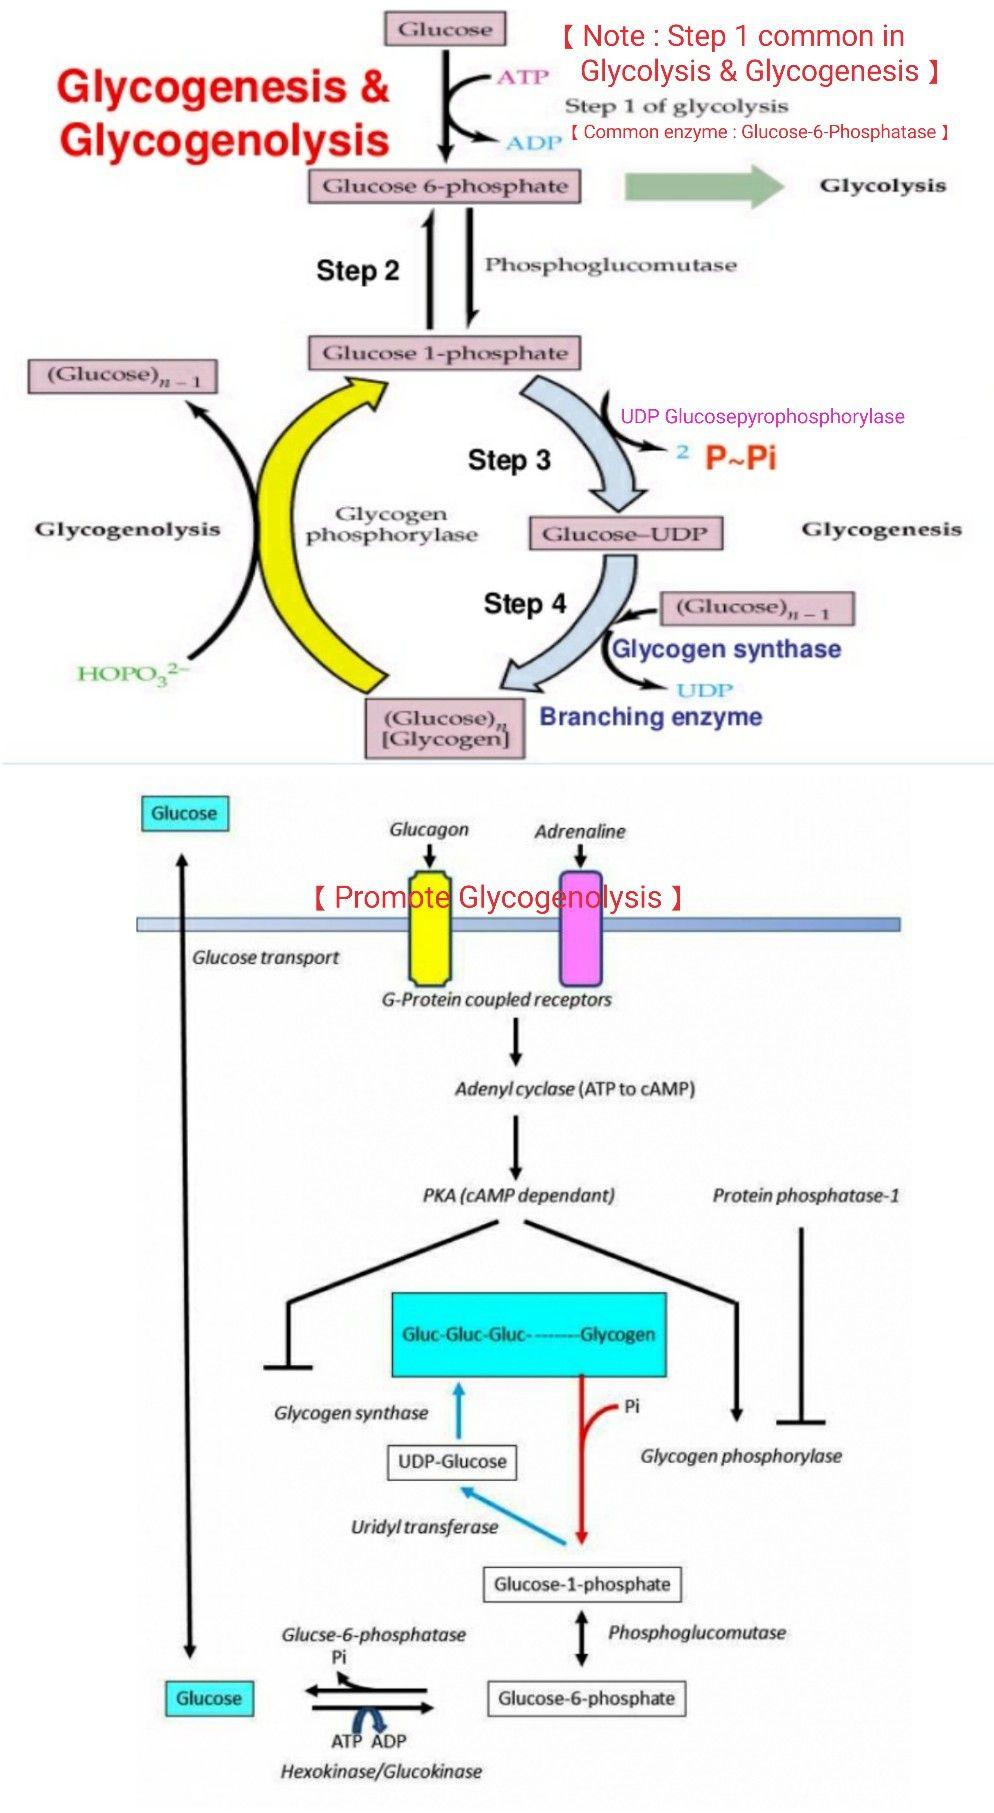 Glycogenesis & Glycogenolysis 【 Note 1st step in